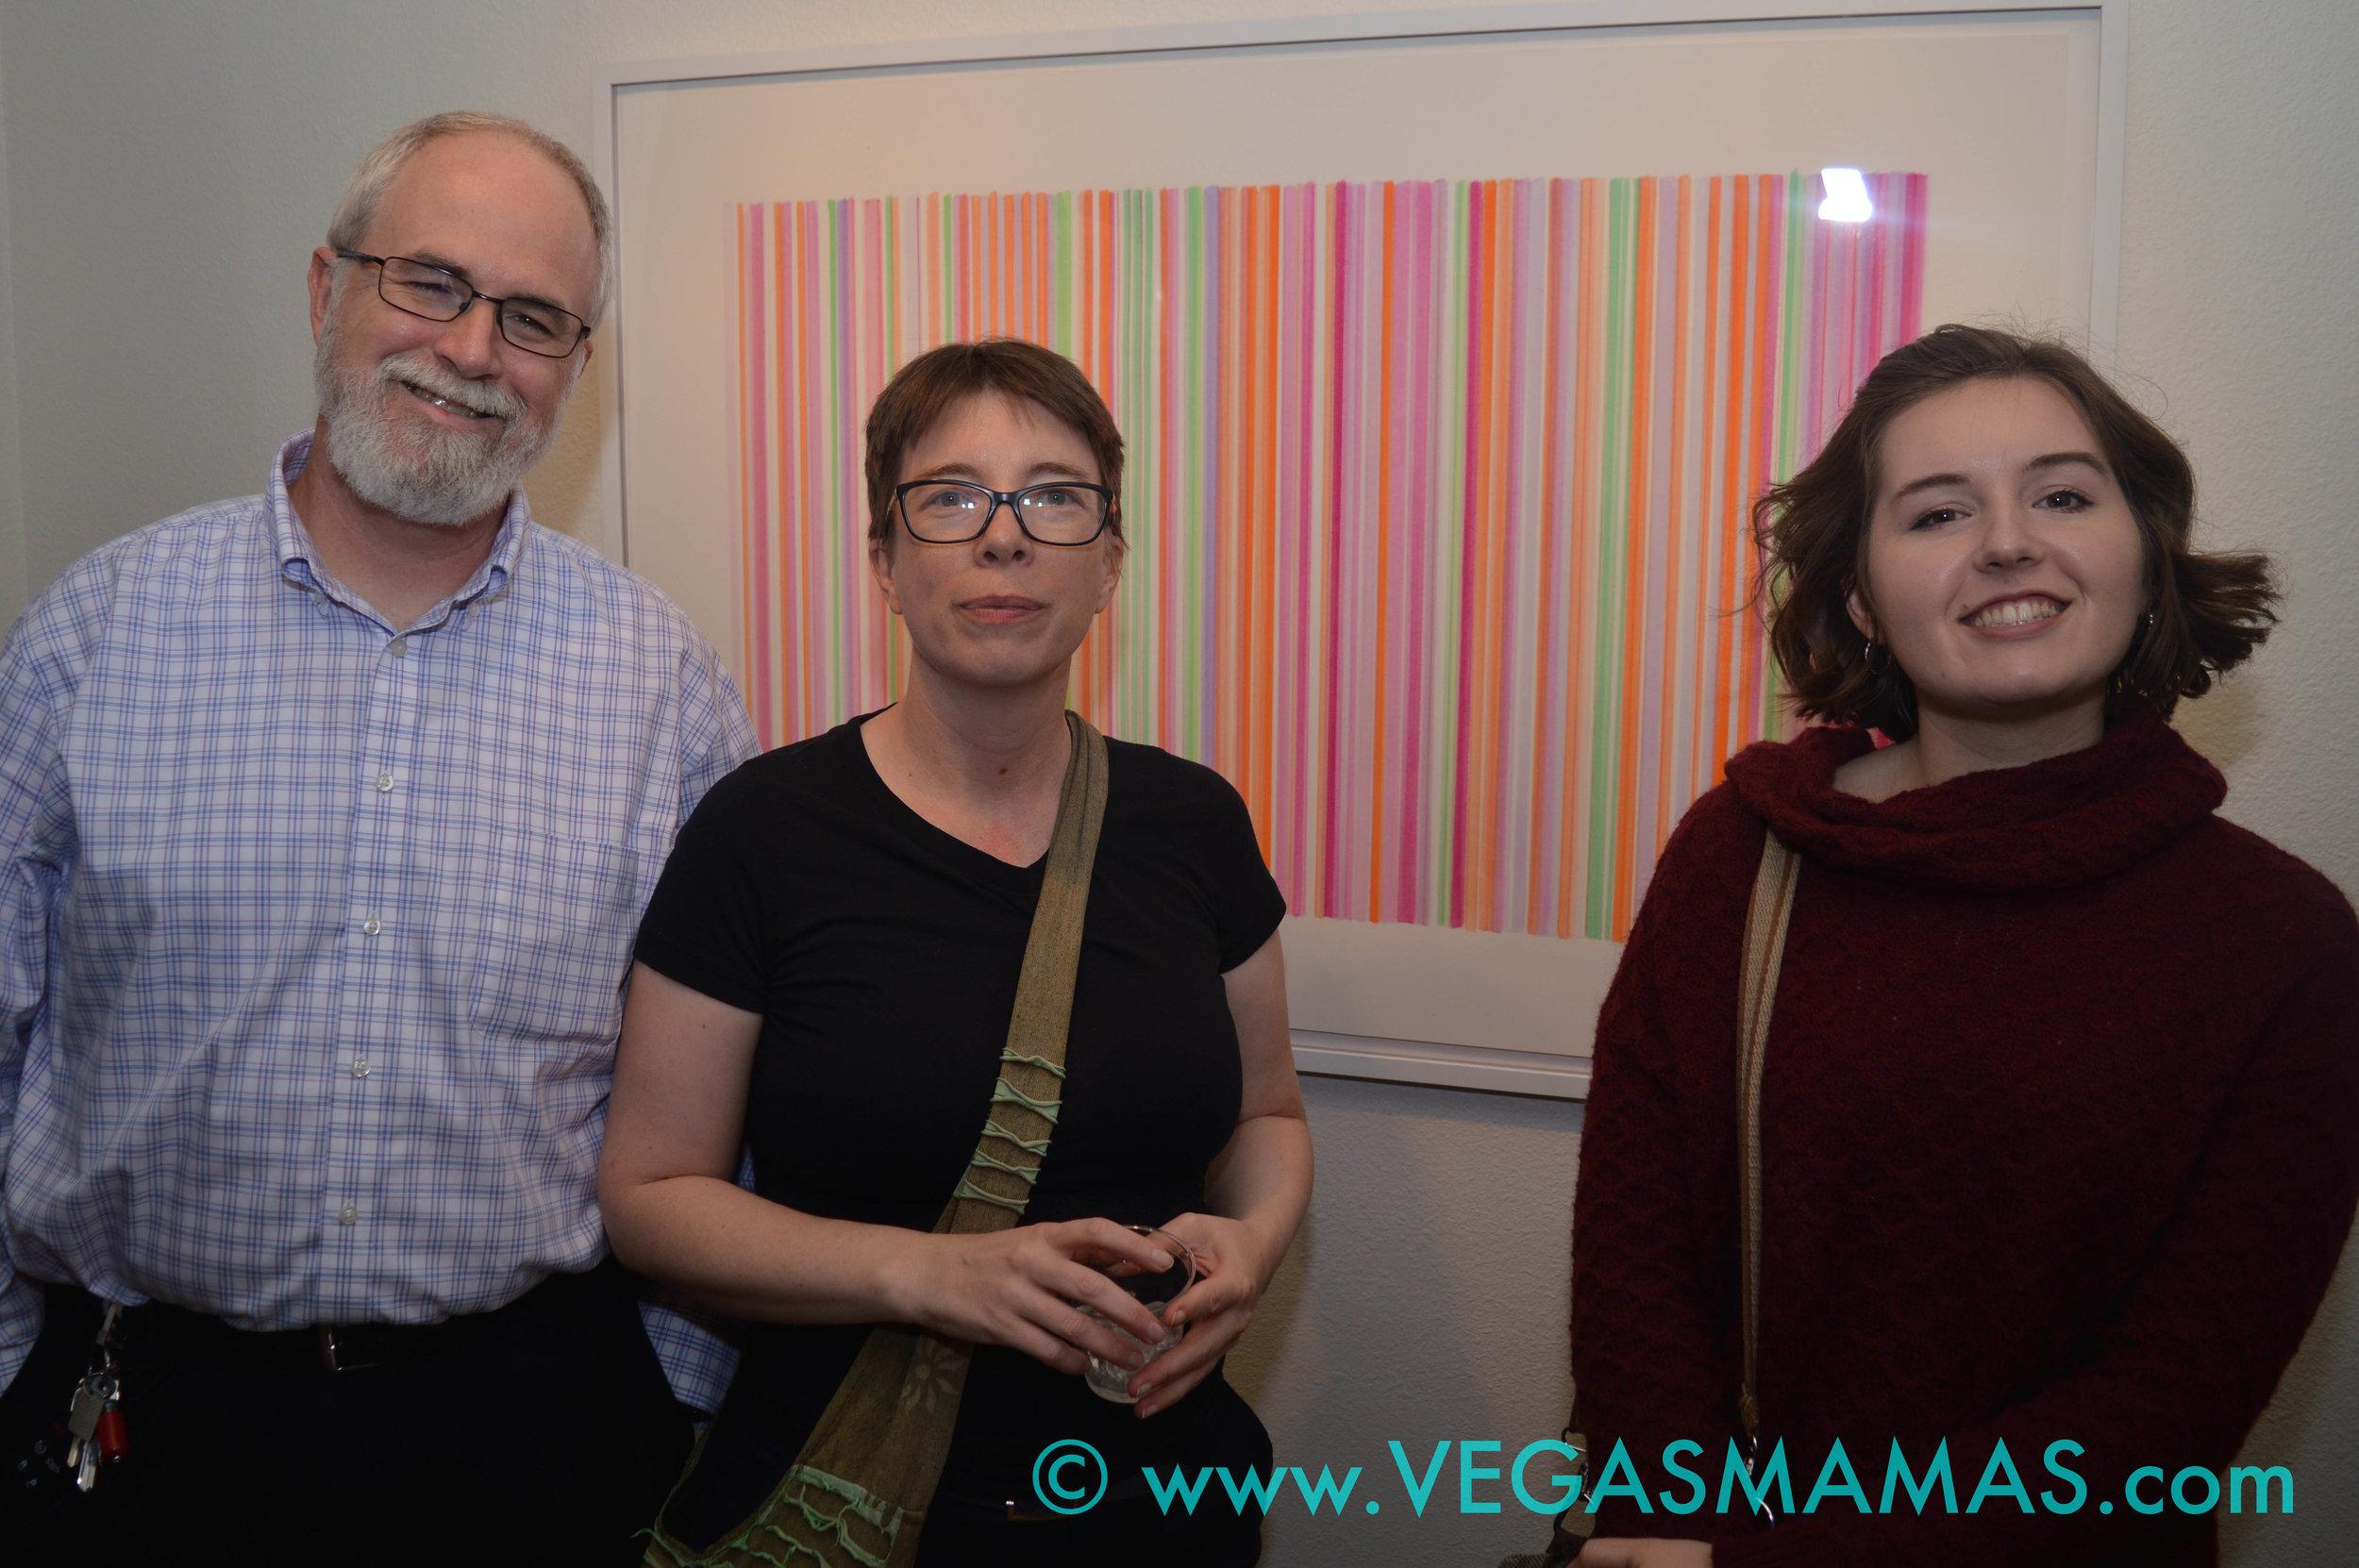 Art Patron with Deanne Sole and LeiAnn Huddleston